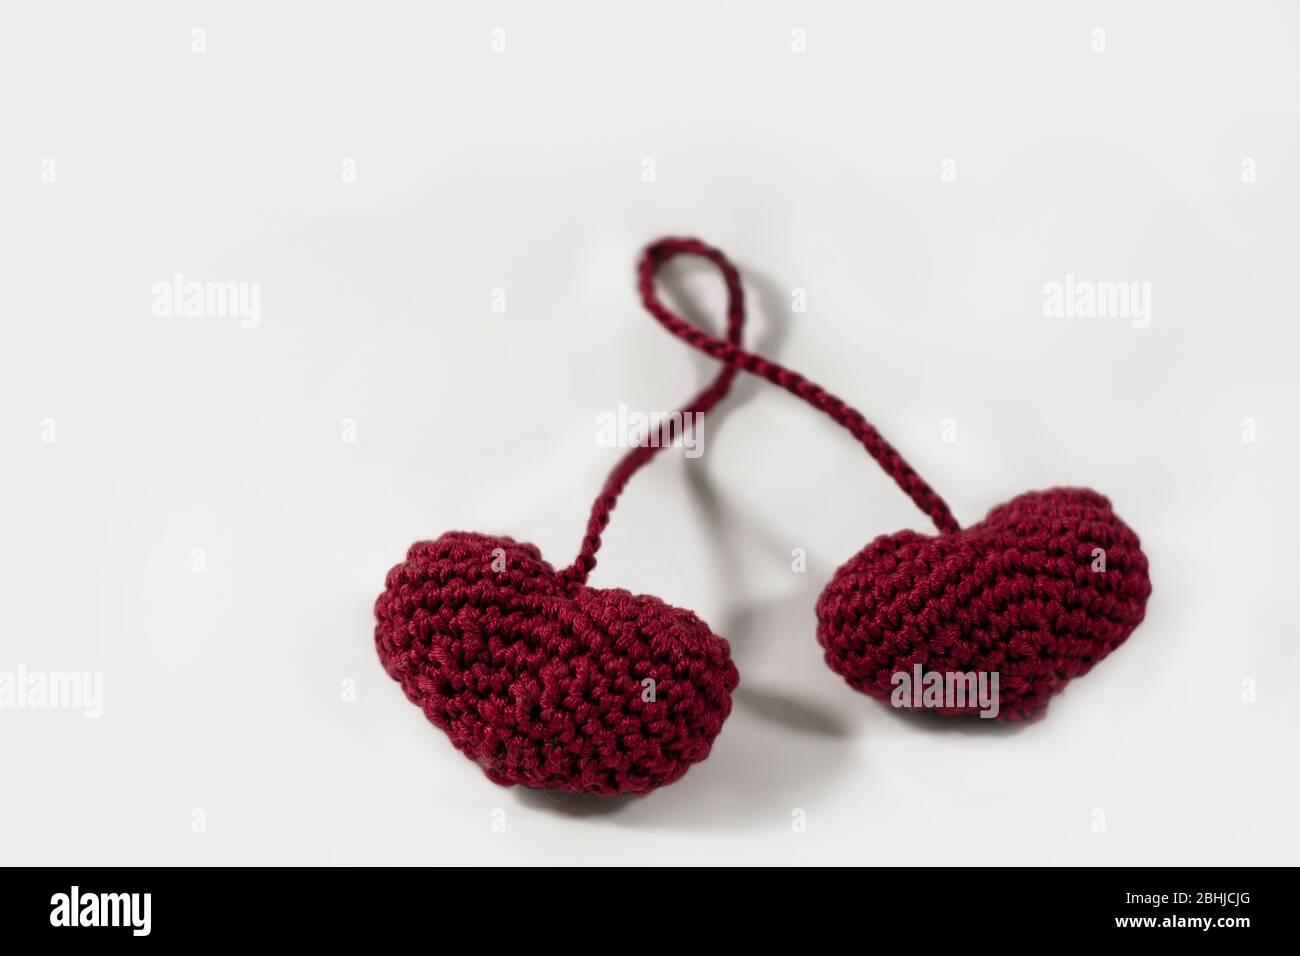 Amigurumi #Häkeln #gehäkelt #Wolle #Winter #Weihnachten ... | 956x1300